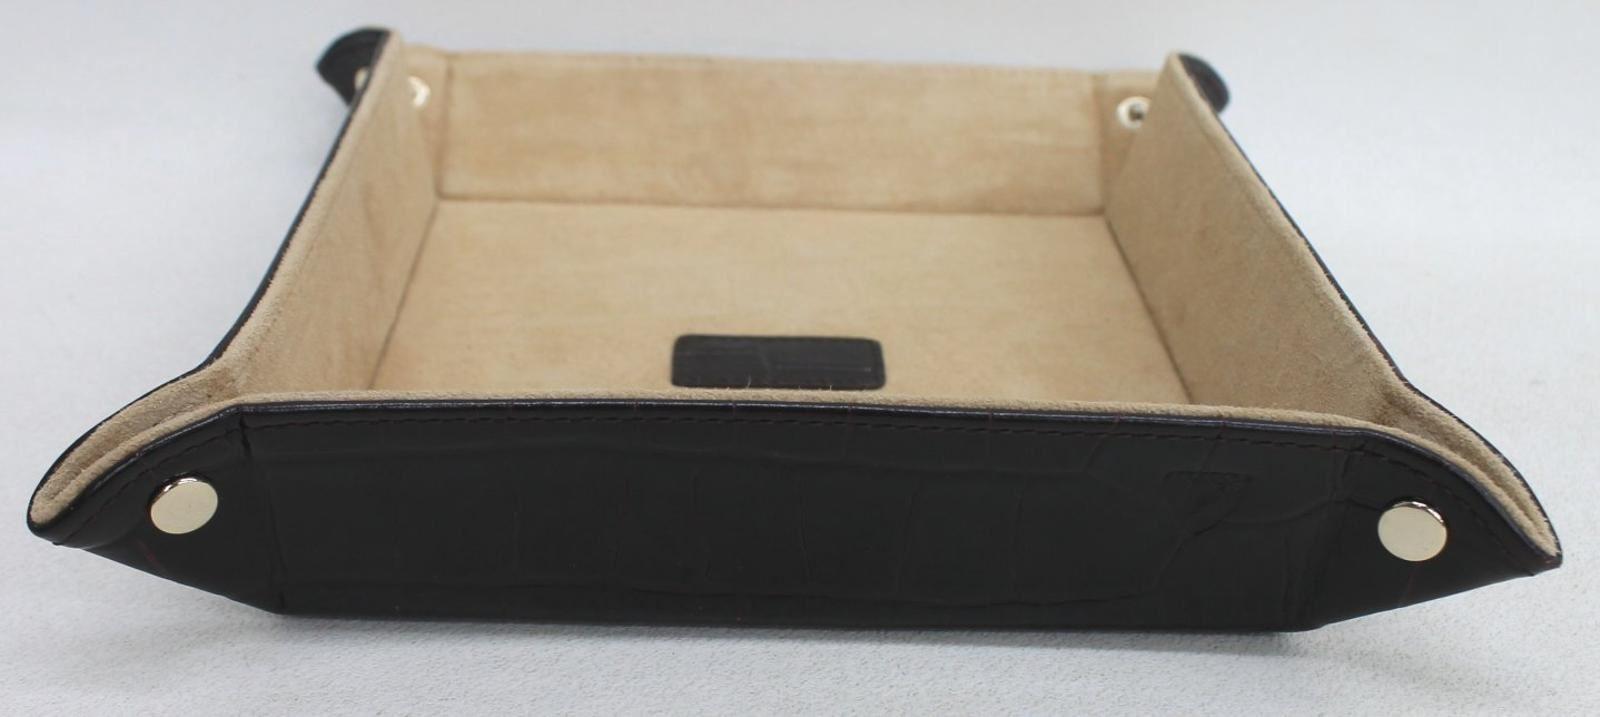 ASPINAL-OF-LONDON-Medium-Mahogany-Croc-Print-Leather-Valet-Tidy-Tray-Holder-NEW